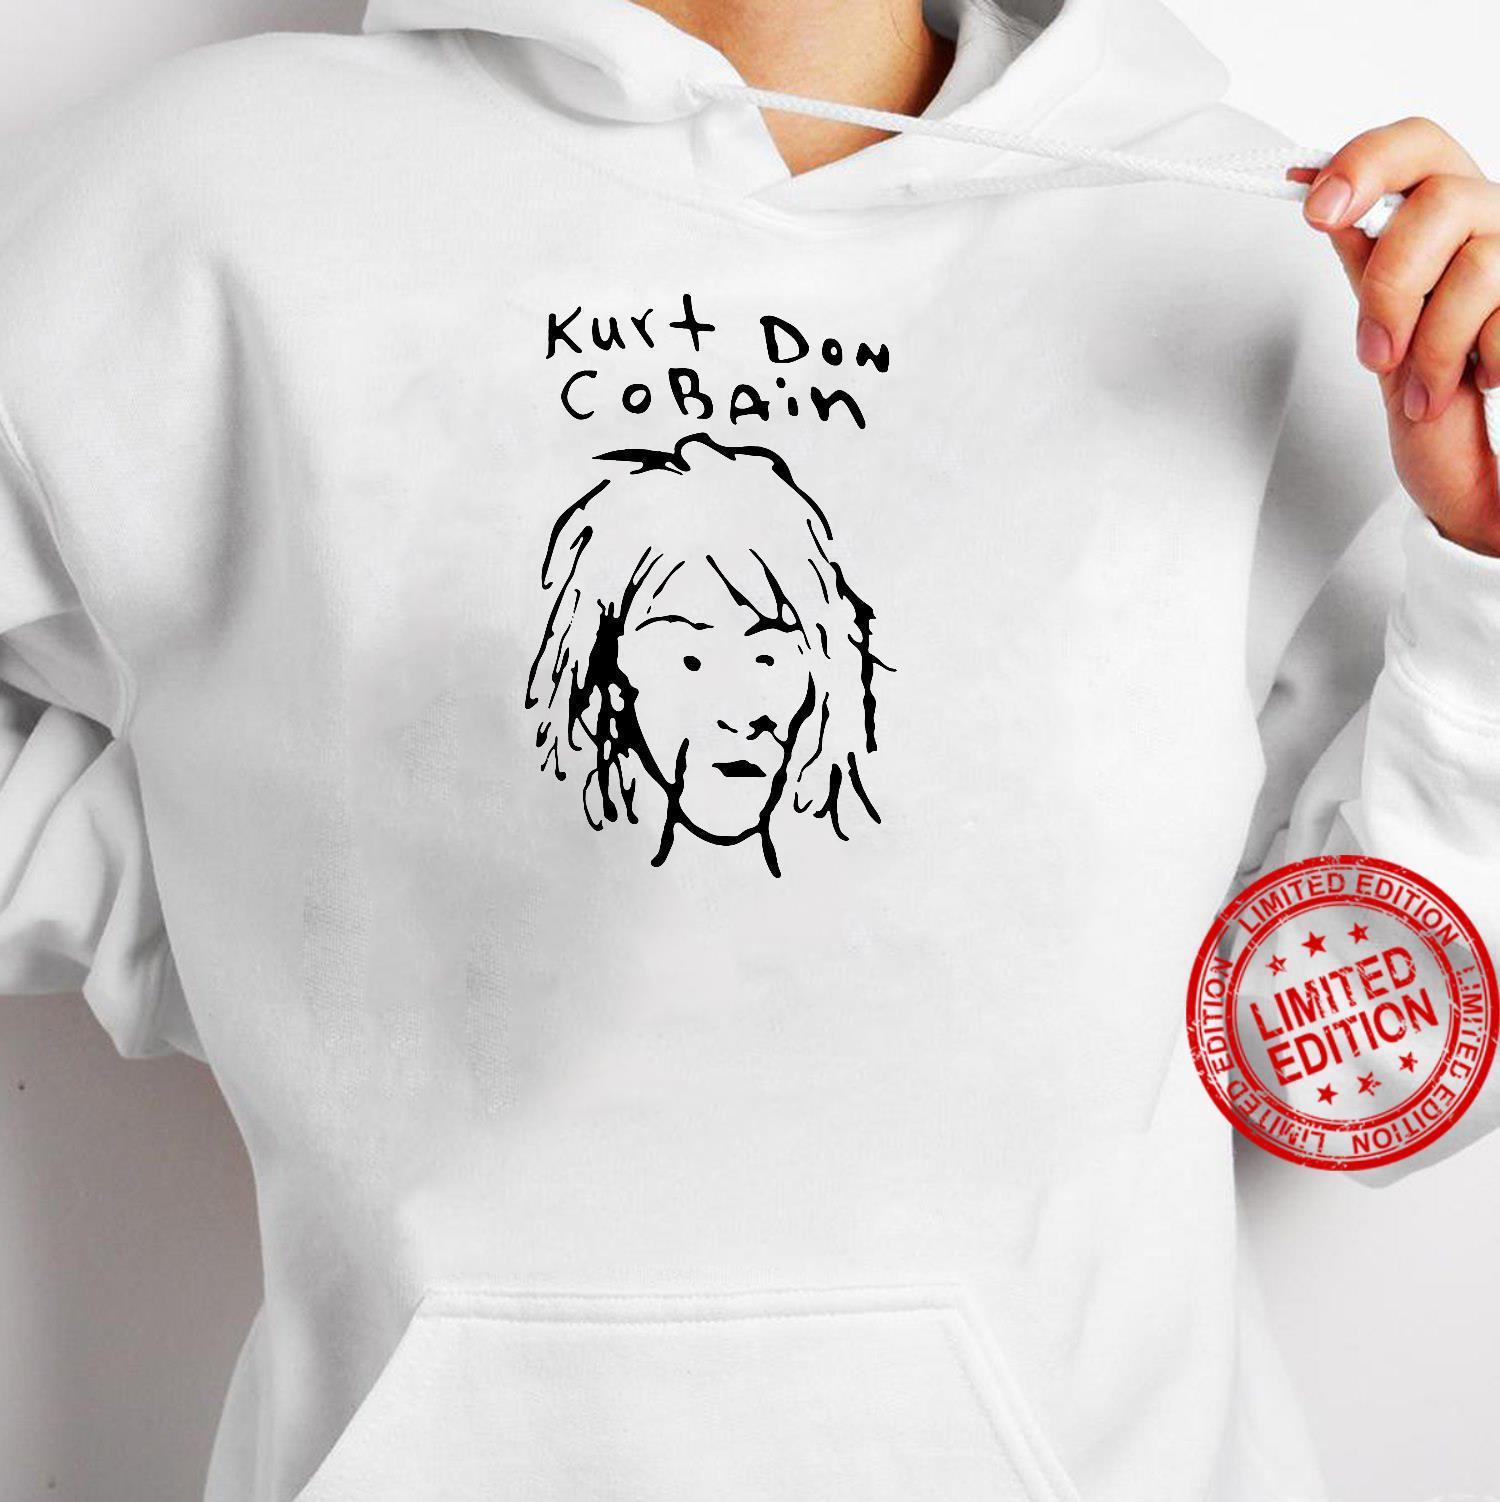 Kurt Don Cobain shirt hoodie